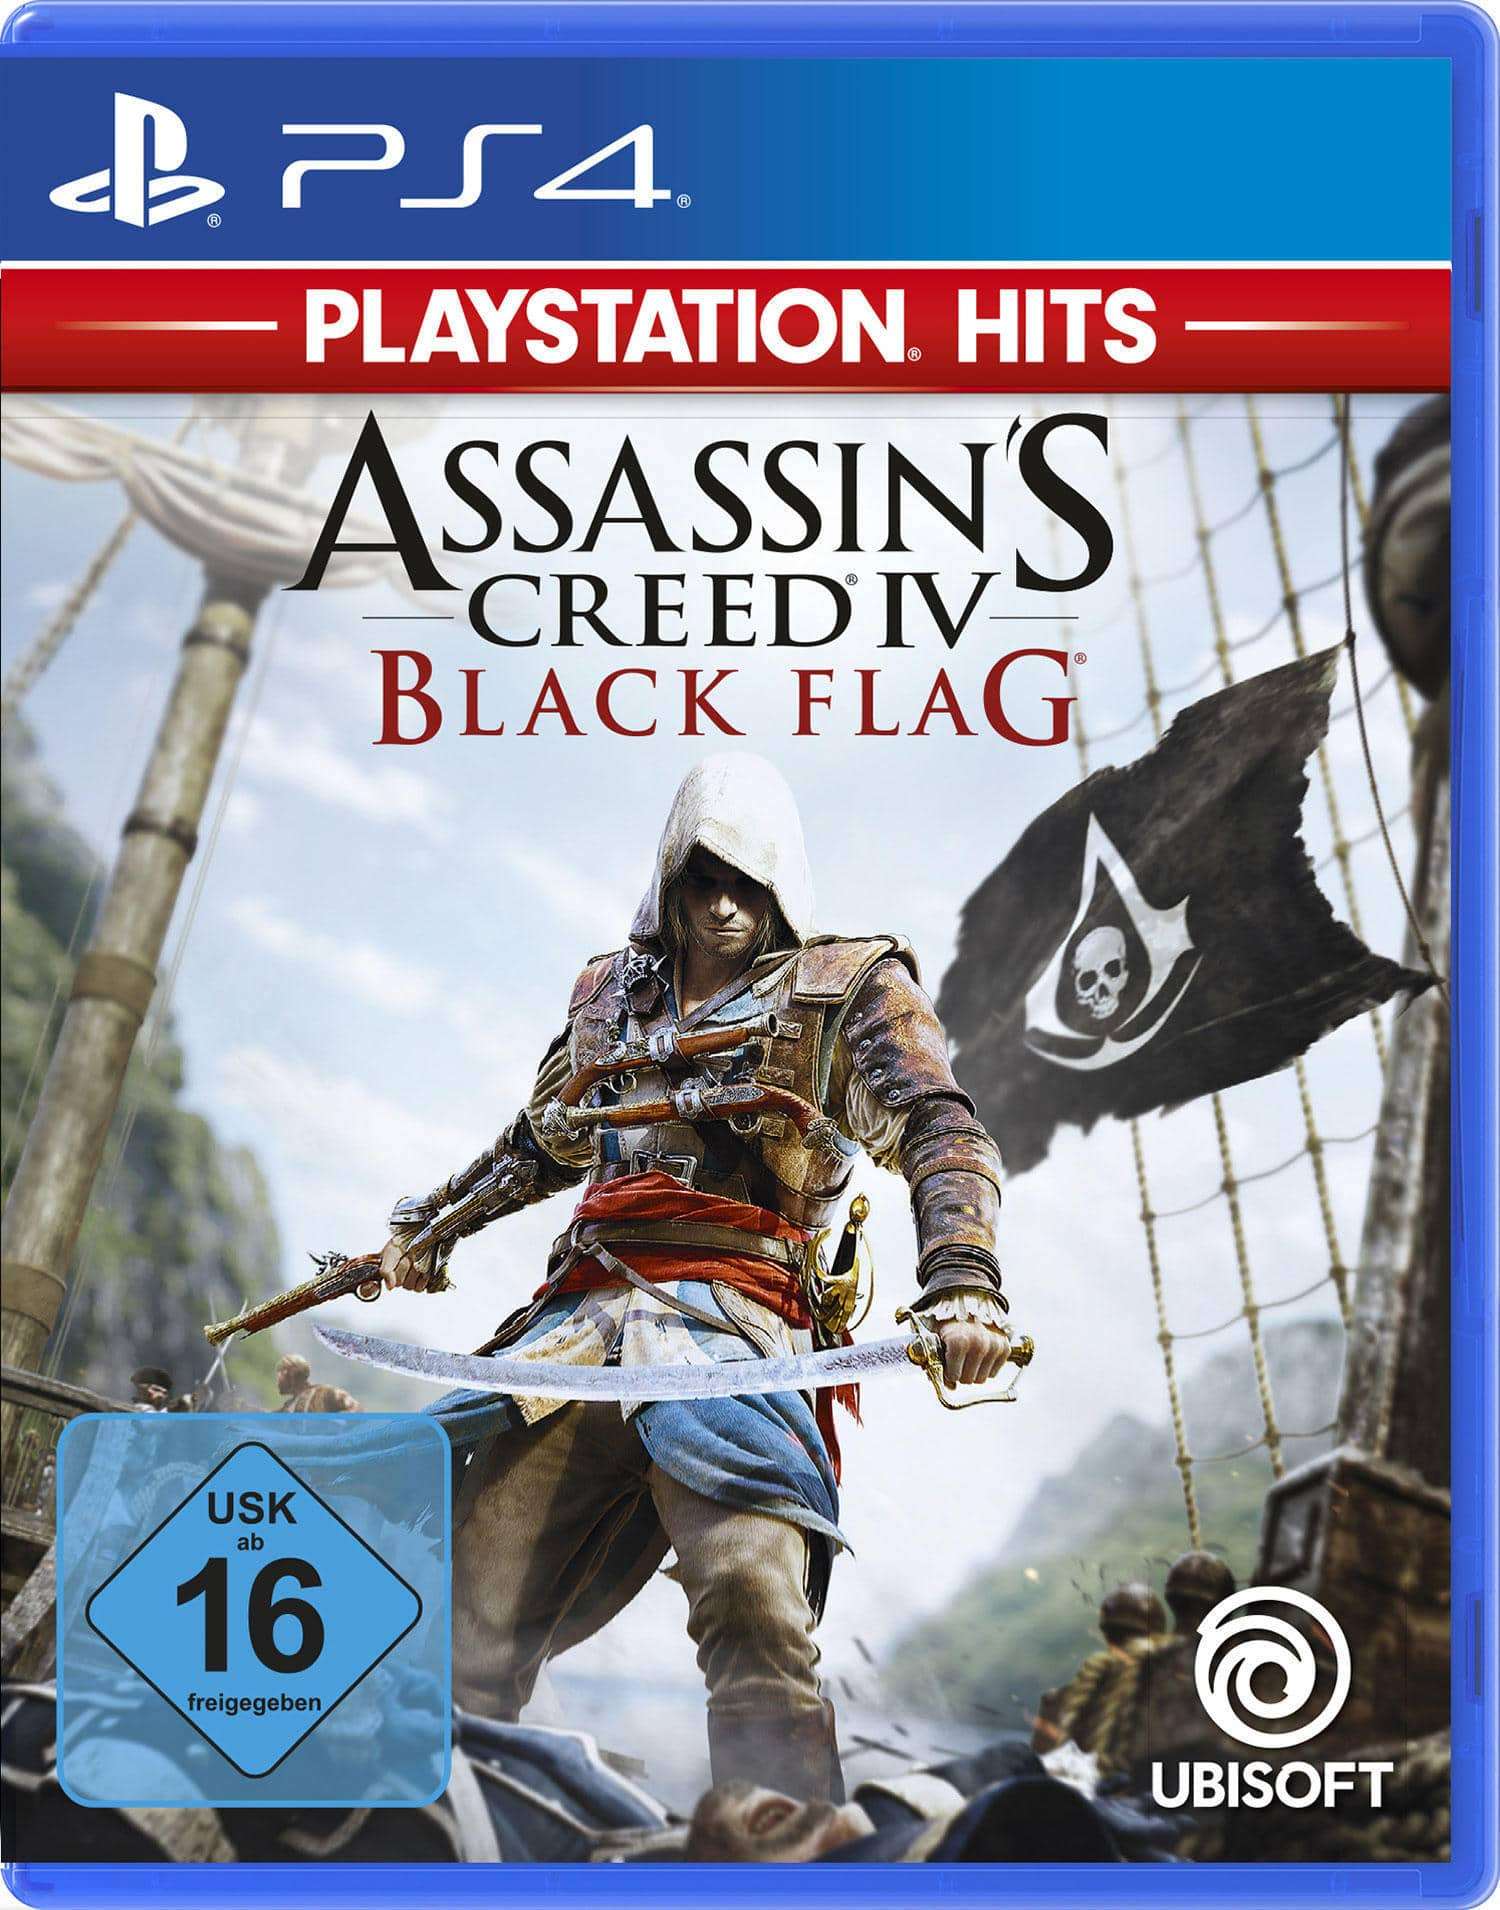 PlayStation Hits: Assassin's Creed IV - Black Flag (PlayStation 4) für 19,99 Euro